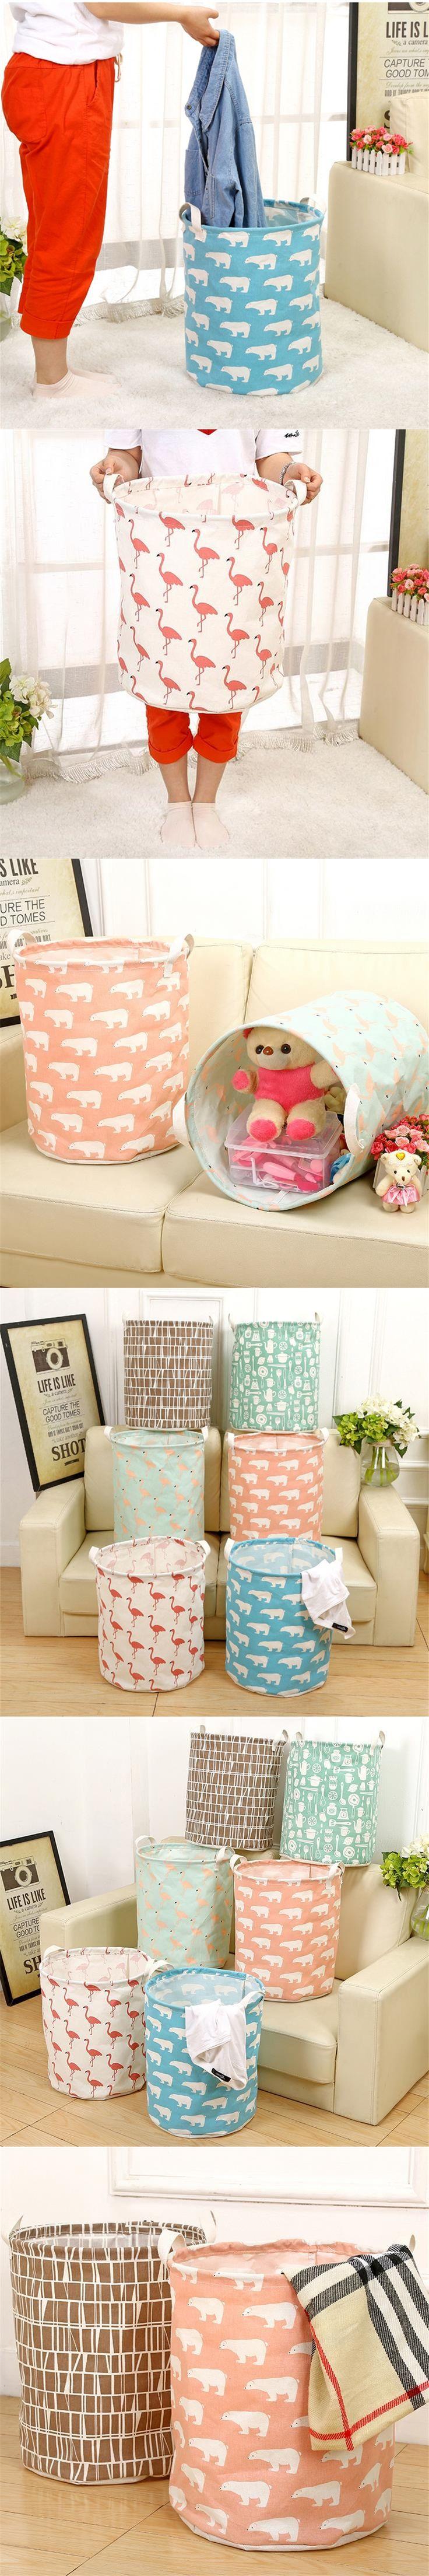 Doreen Box 41x30cm Flamingo Large Capacity Linen Laundry Baskets Bags Dirty Clothes Storage Barrels Home Sundries Toys Organizer